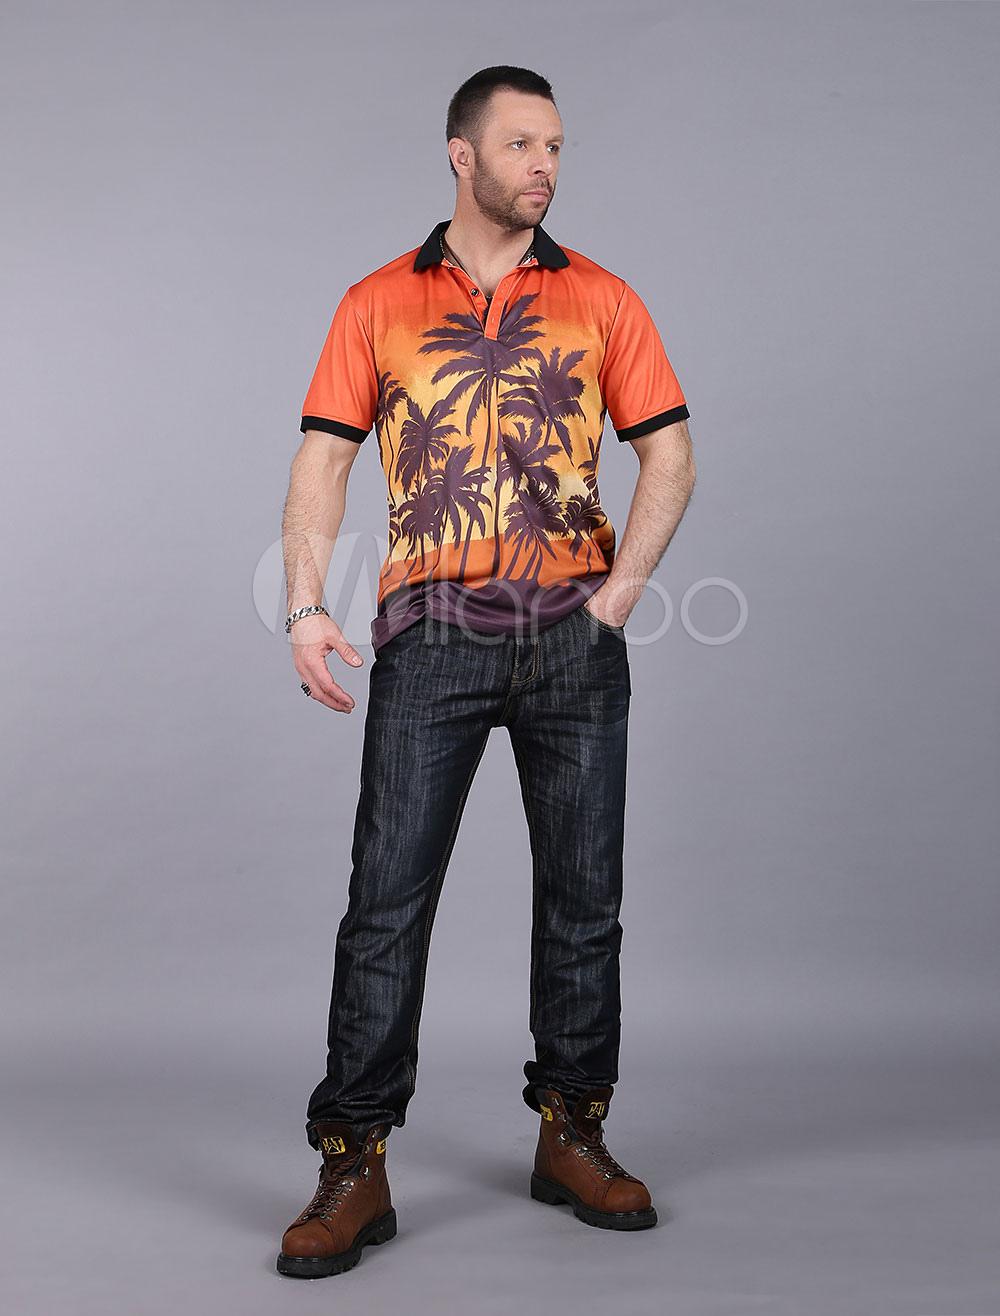 Cotton Polo Shirt Men's Burgundy Turndown Collar Short Sleeve Palm Tree Printed Shirt